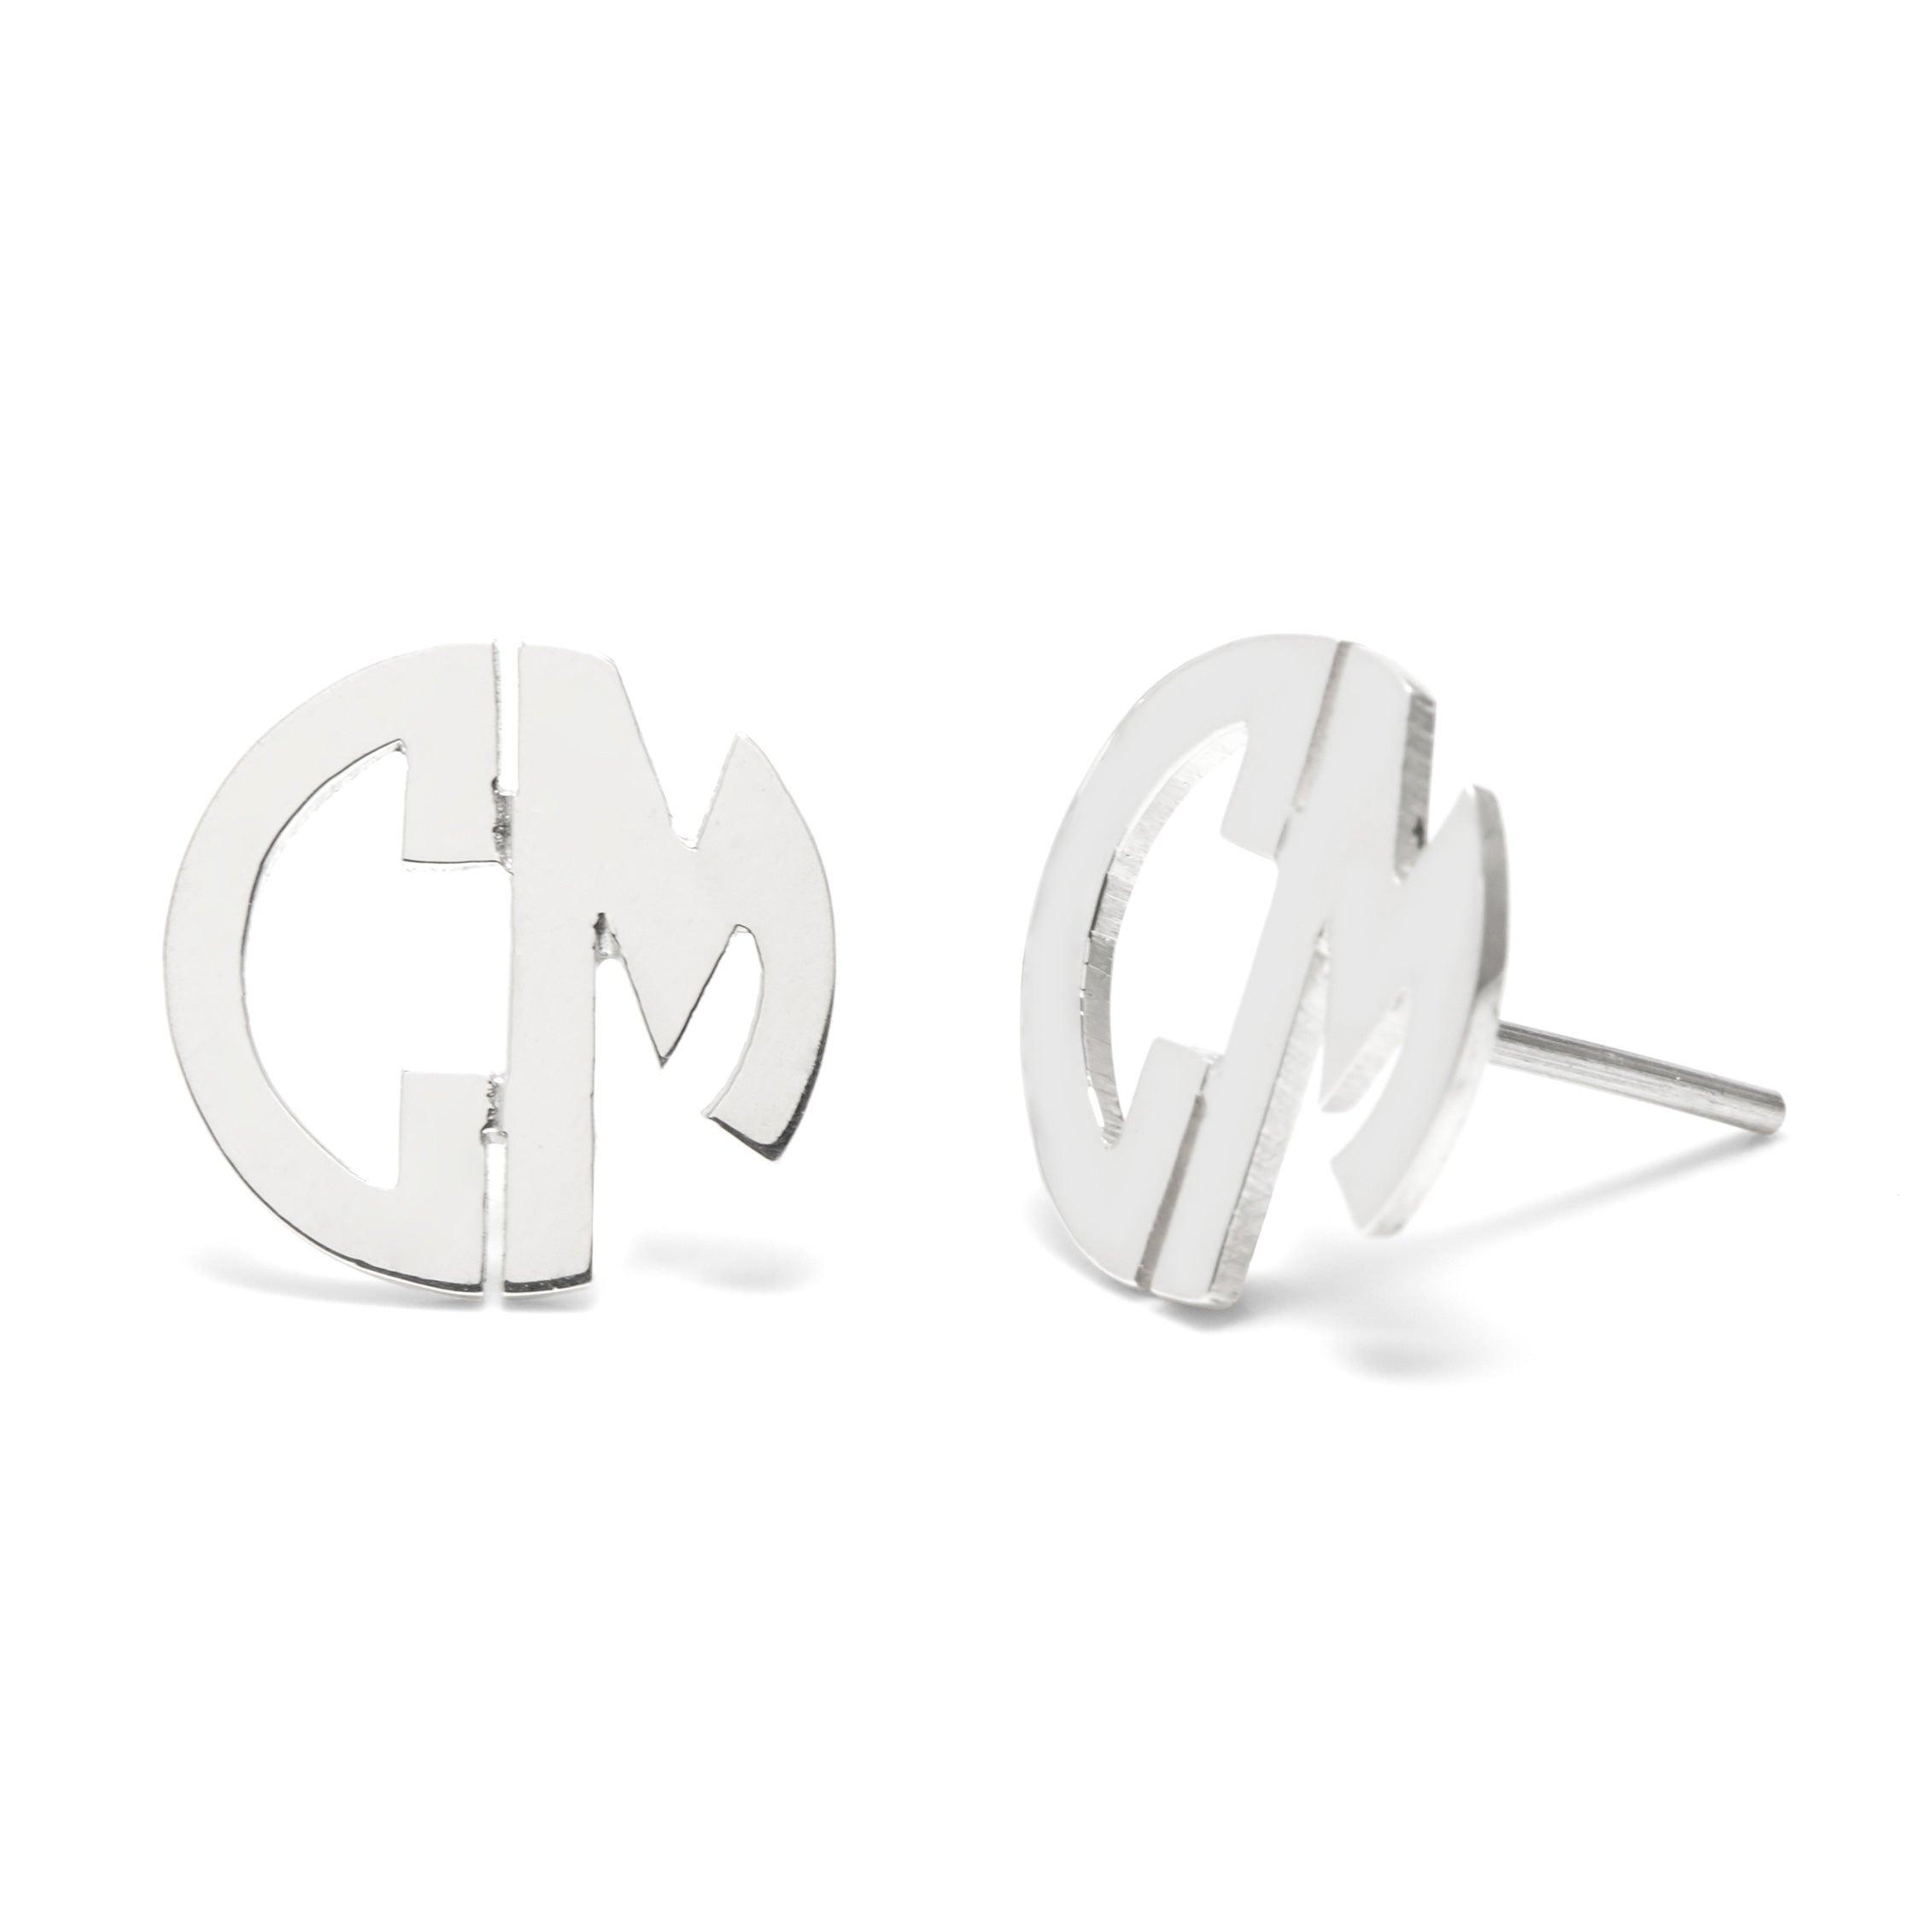 Two Initial Block Monogram Silver Earrings